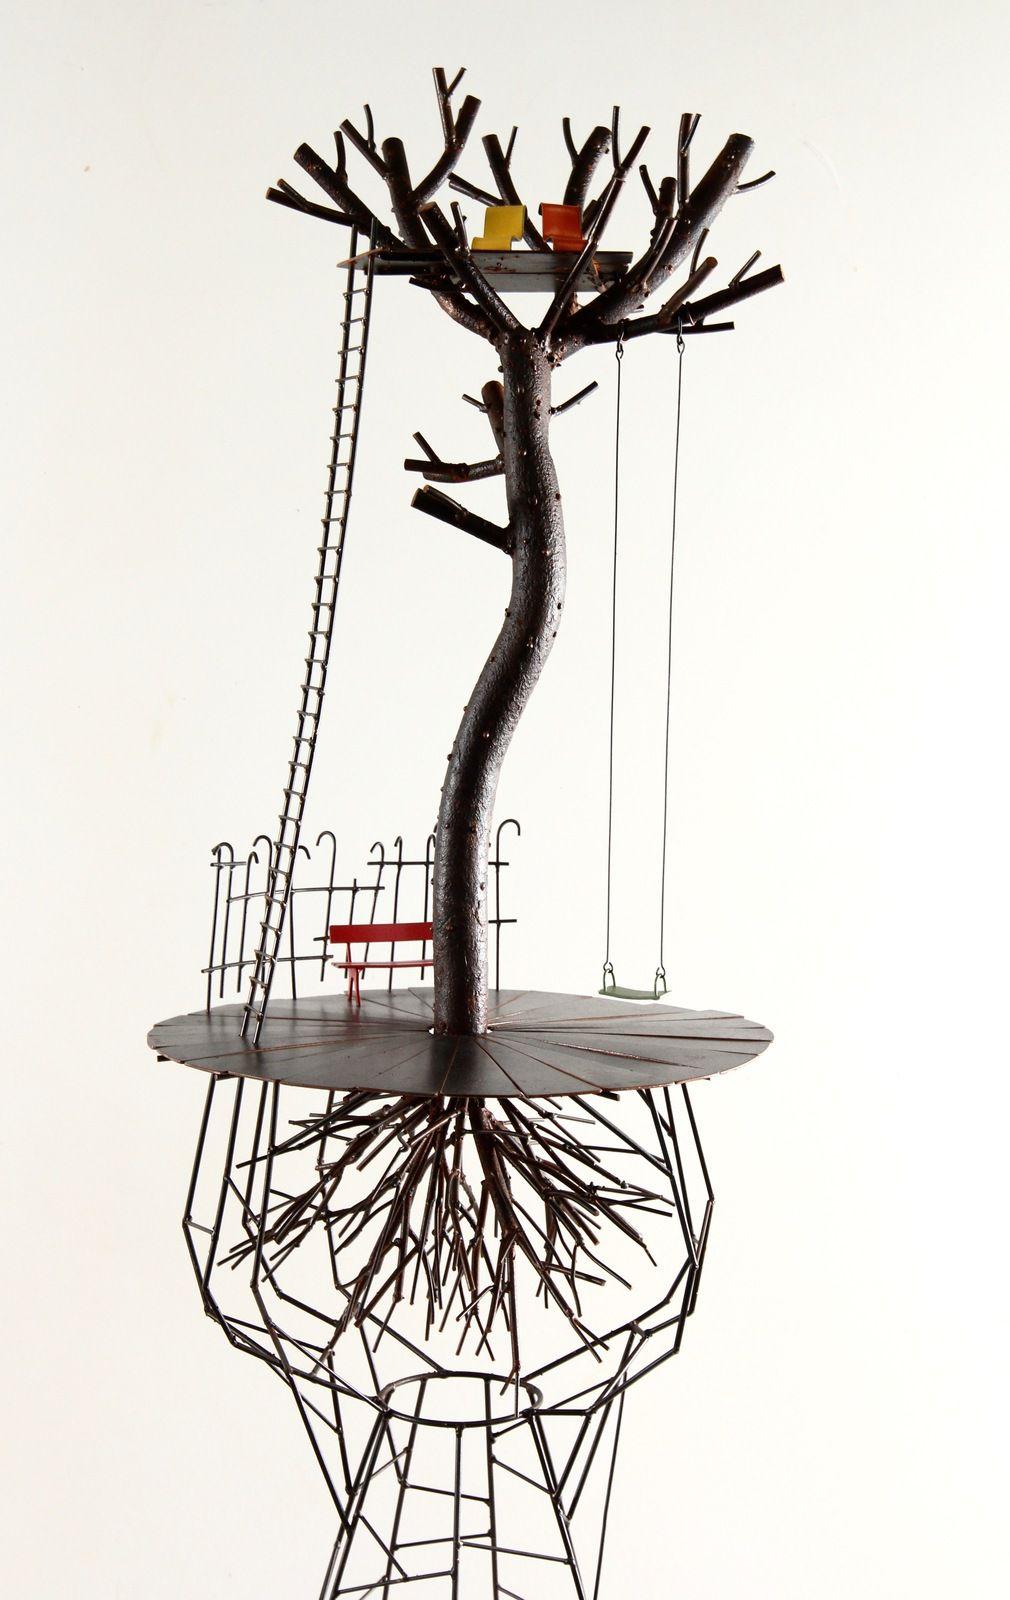 L'échappée XIX, h: 77 cm - L'amour, h: 74 cm - Le nid, h: 143 cm